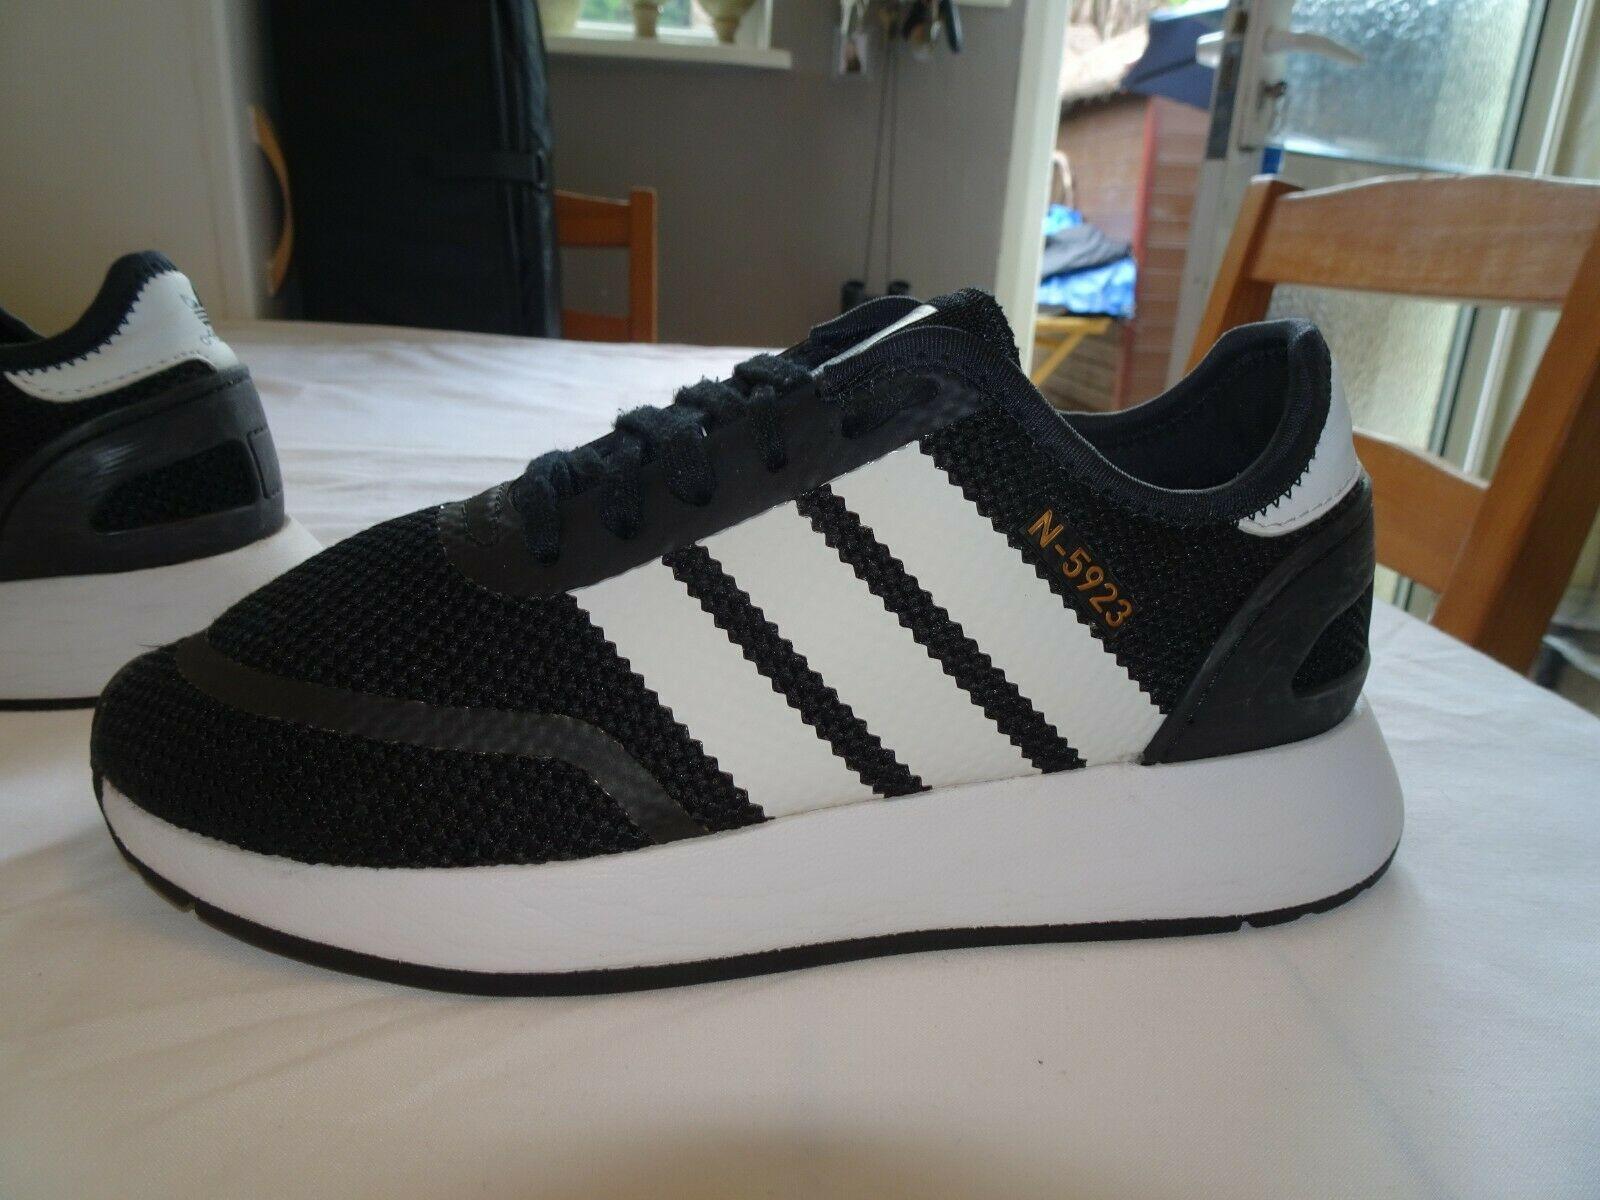 Adidas N 5923 Black White